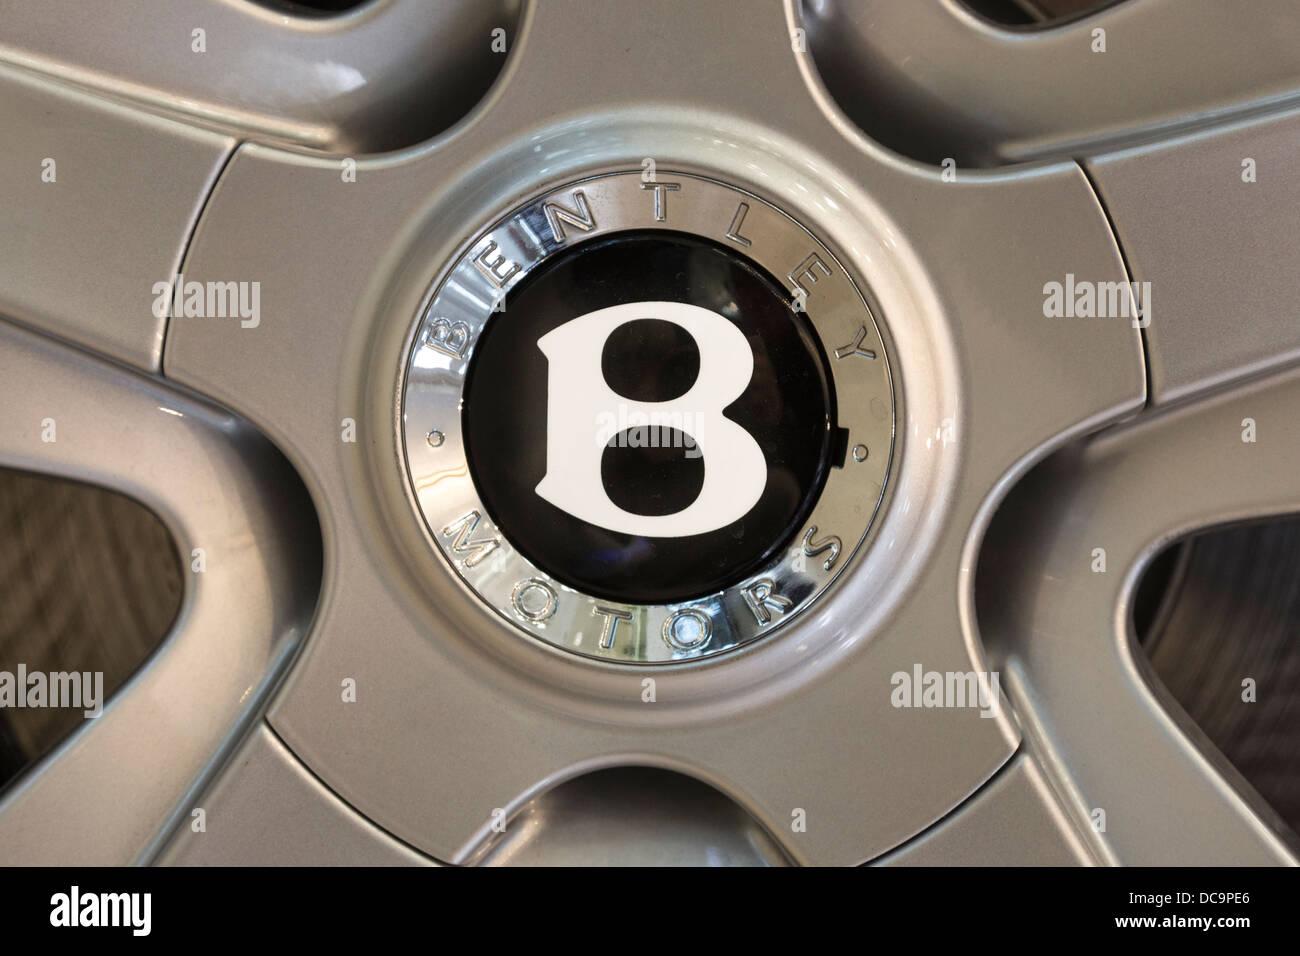 detail of wheel of Bentley Flying Spur car, Duty Free area, Doha, Qatar - Stock Image